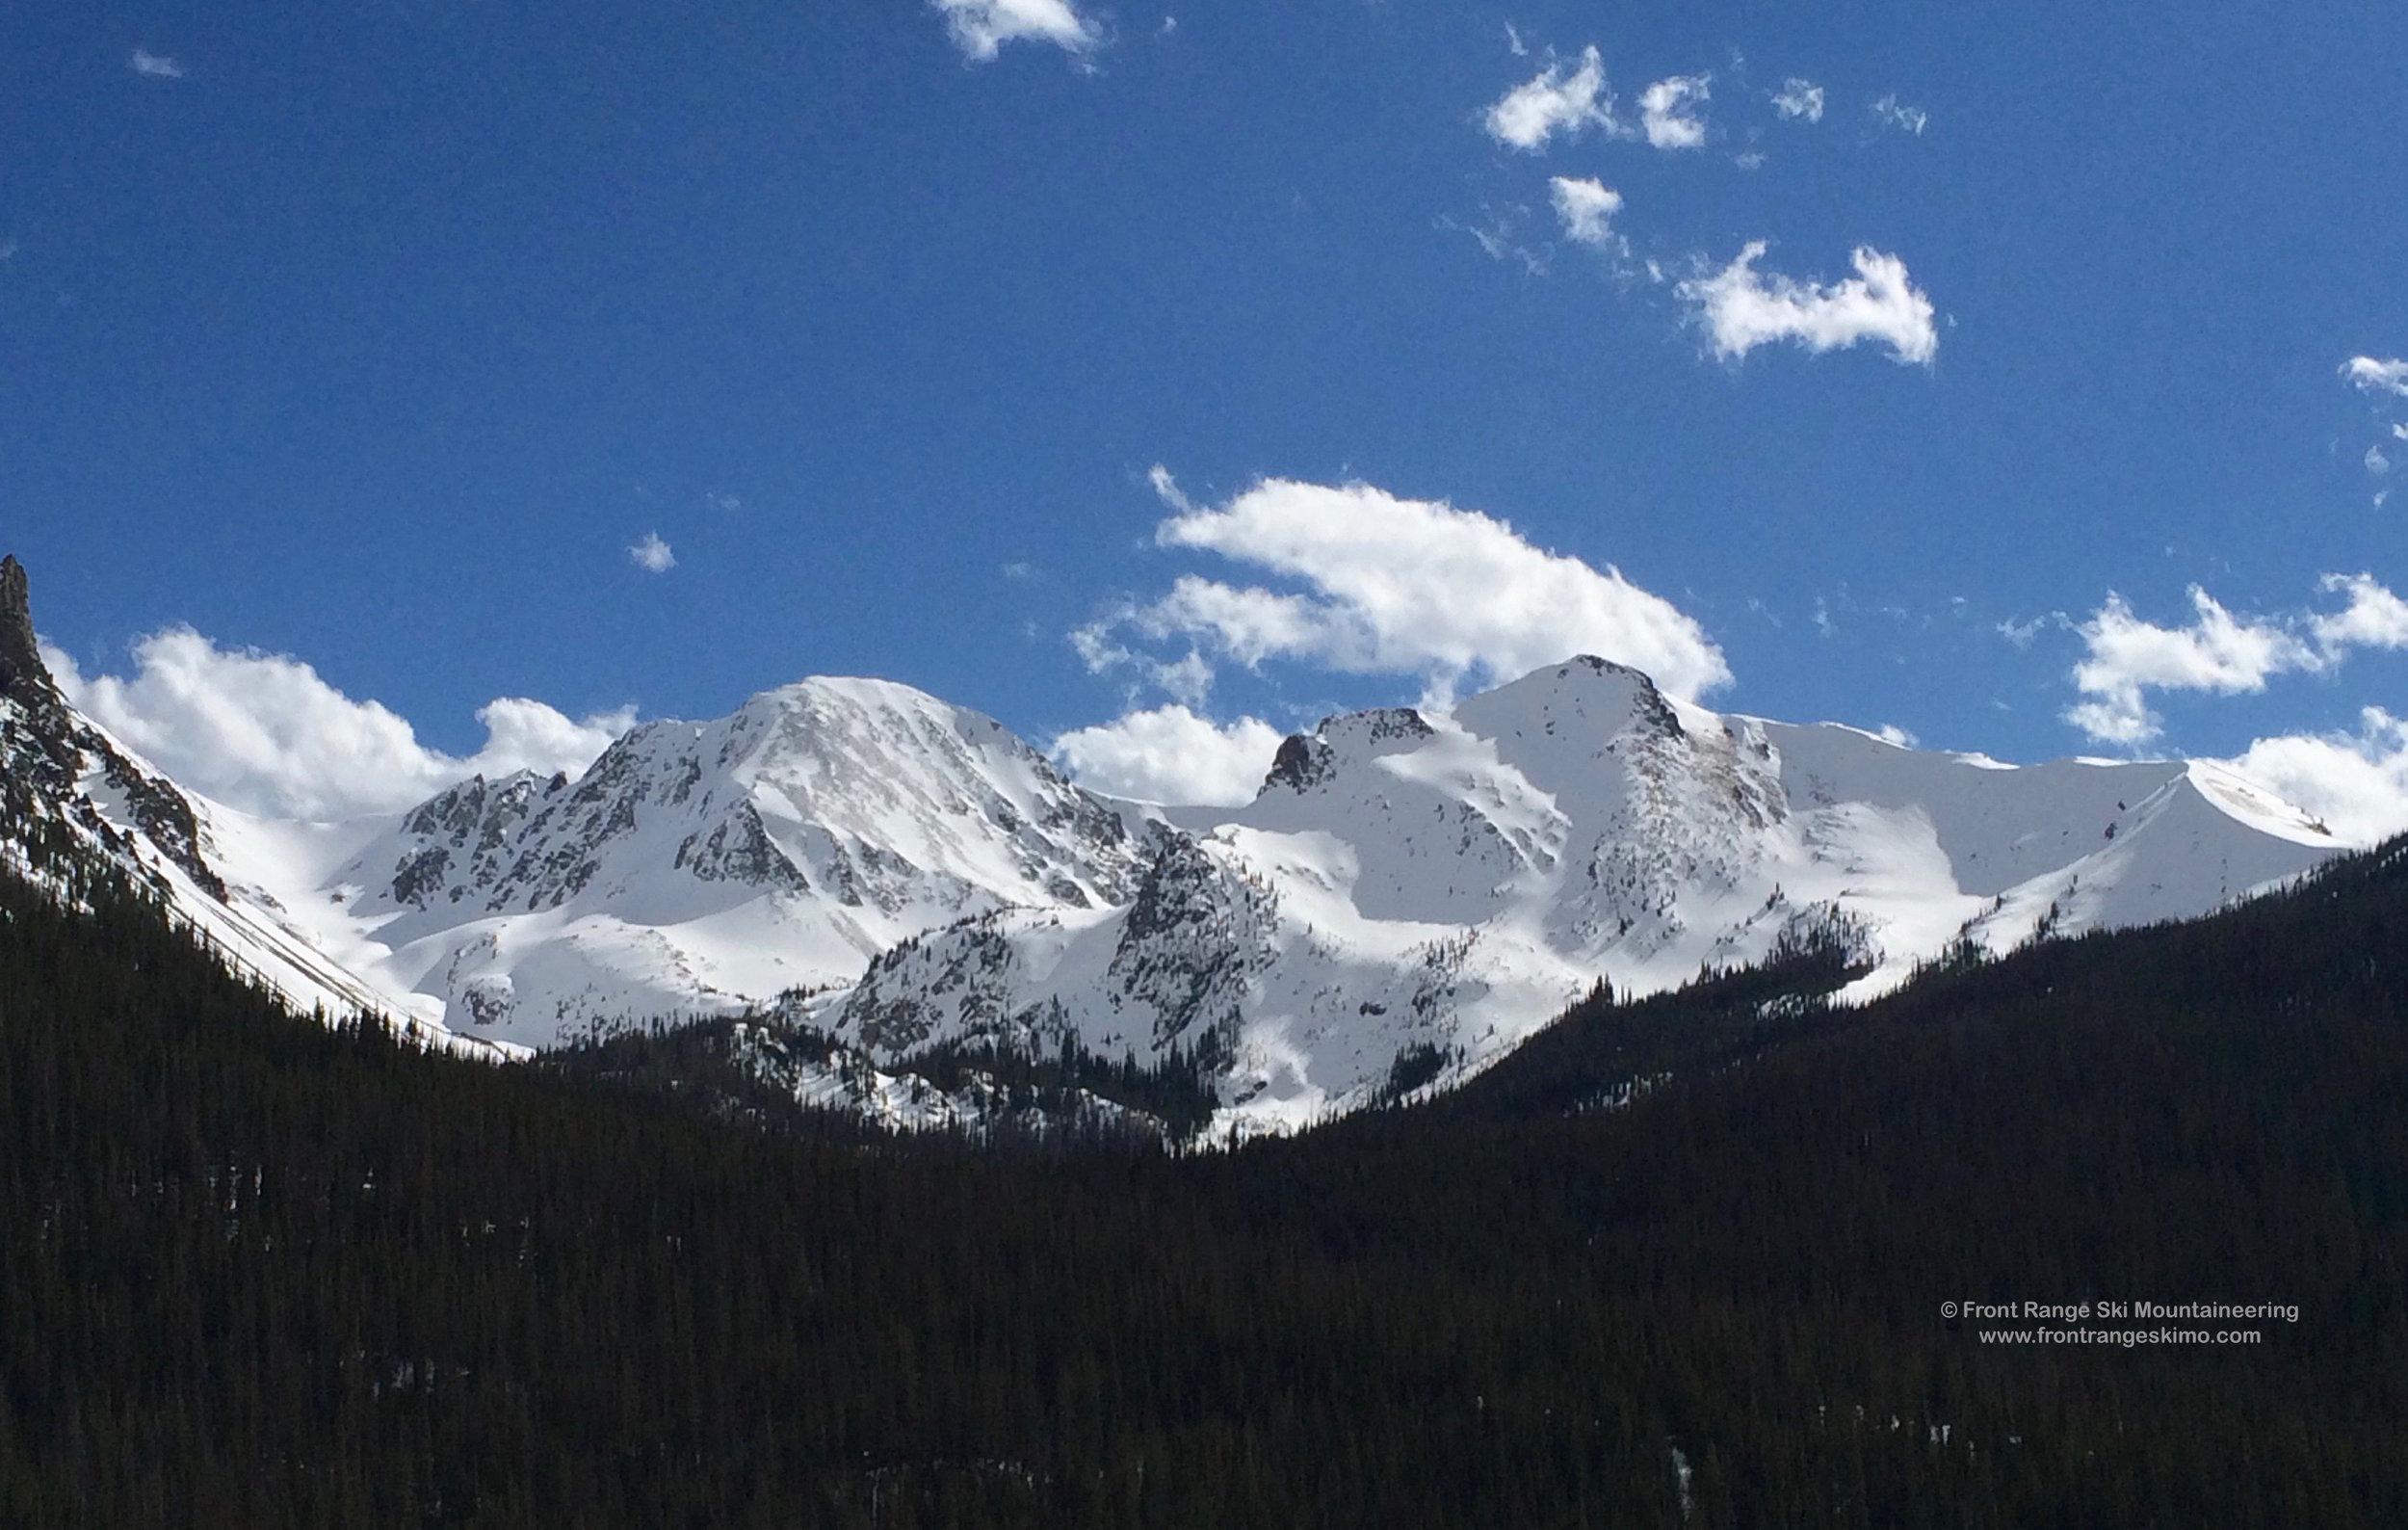 Mount Mahler and Braddock Peak as seen from Highway 14.